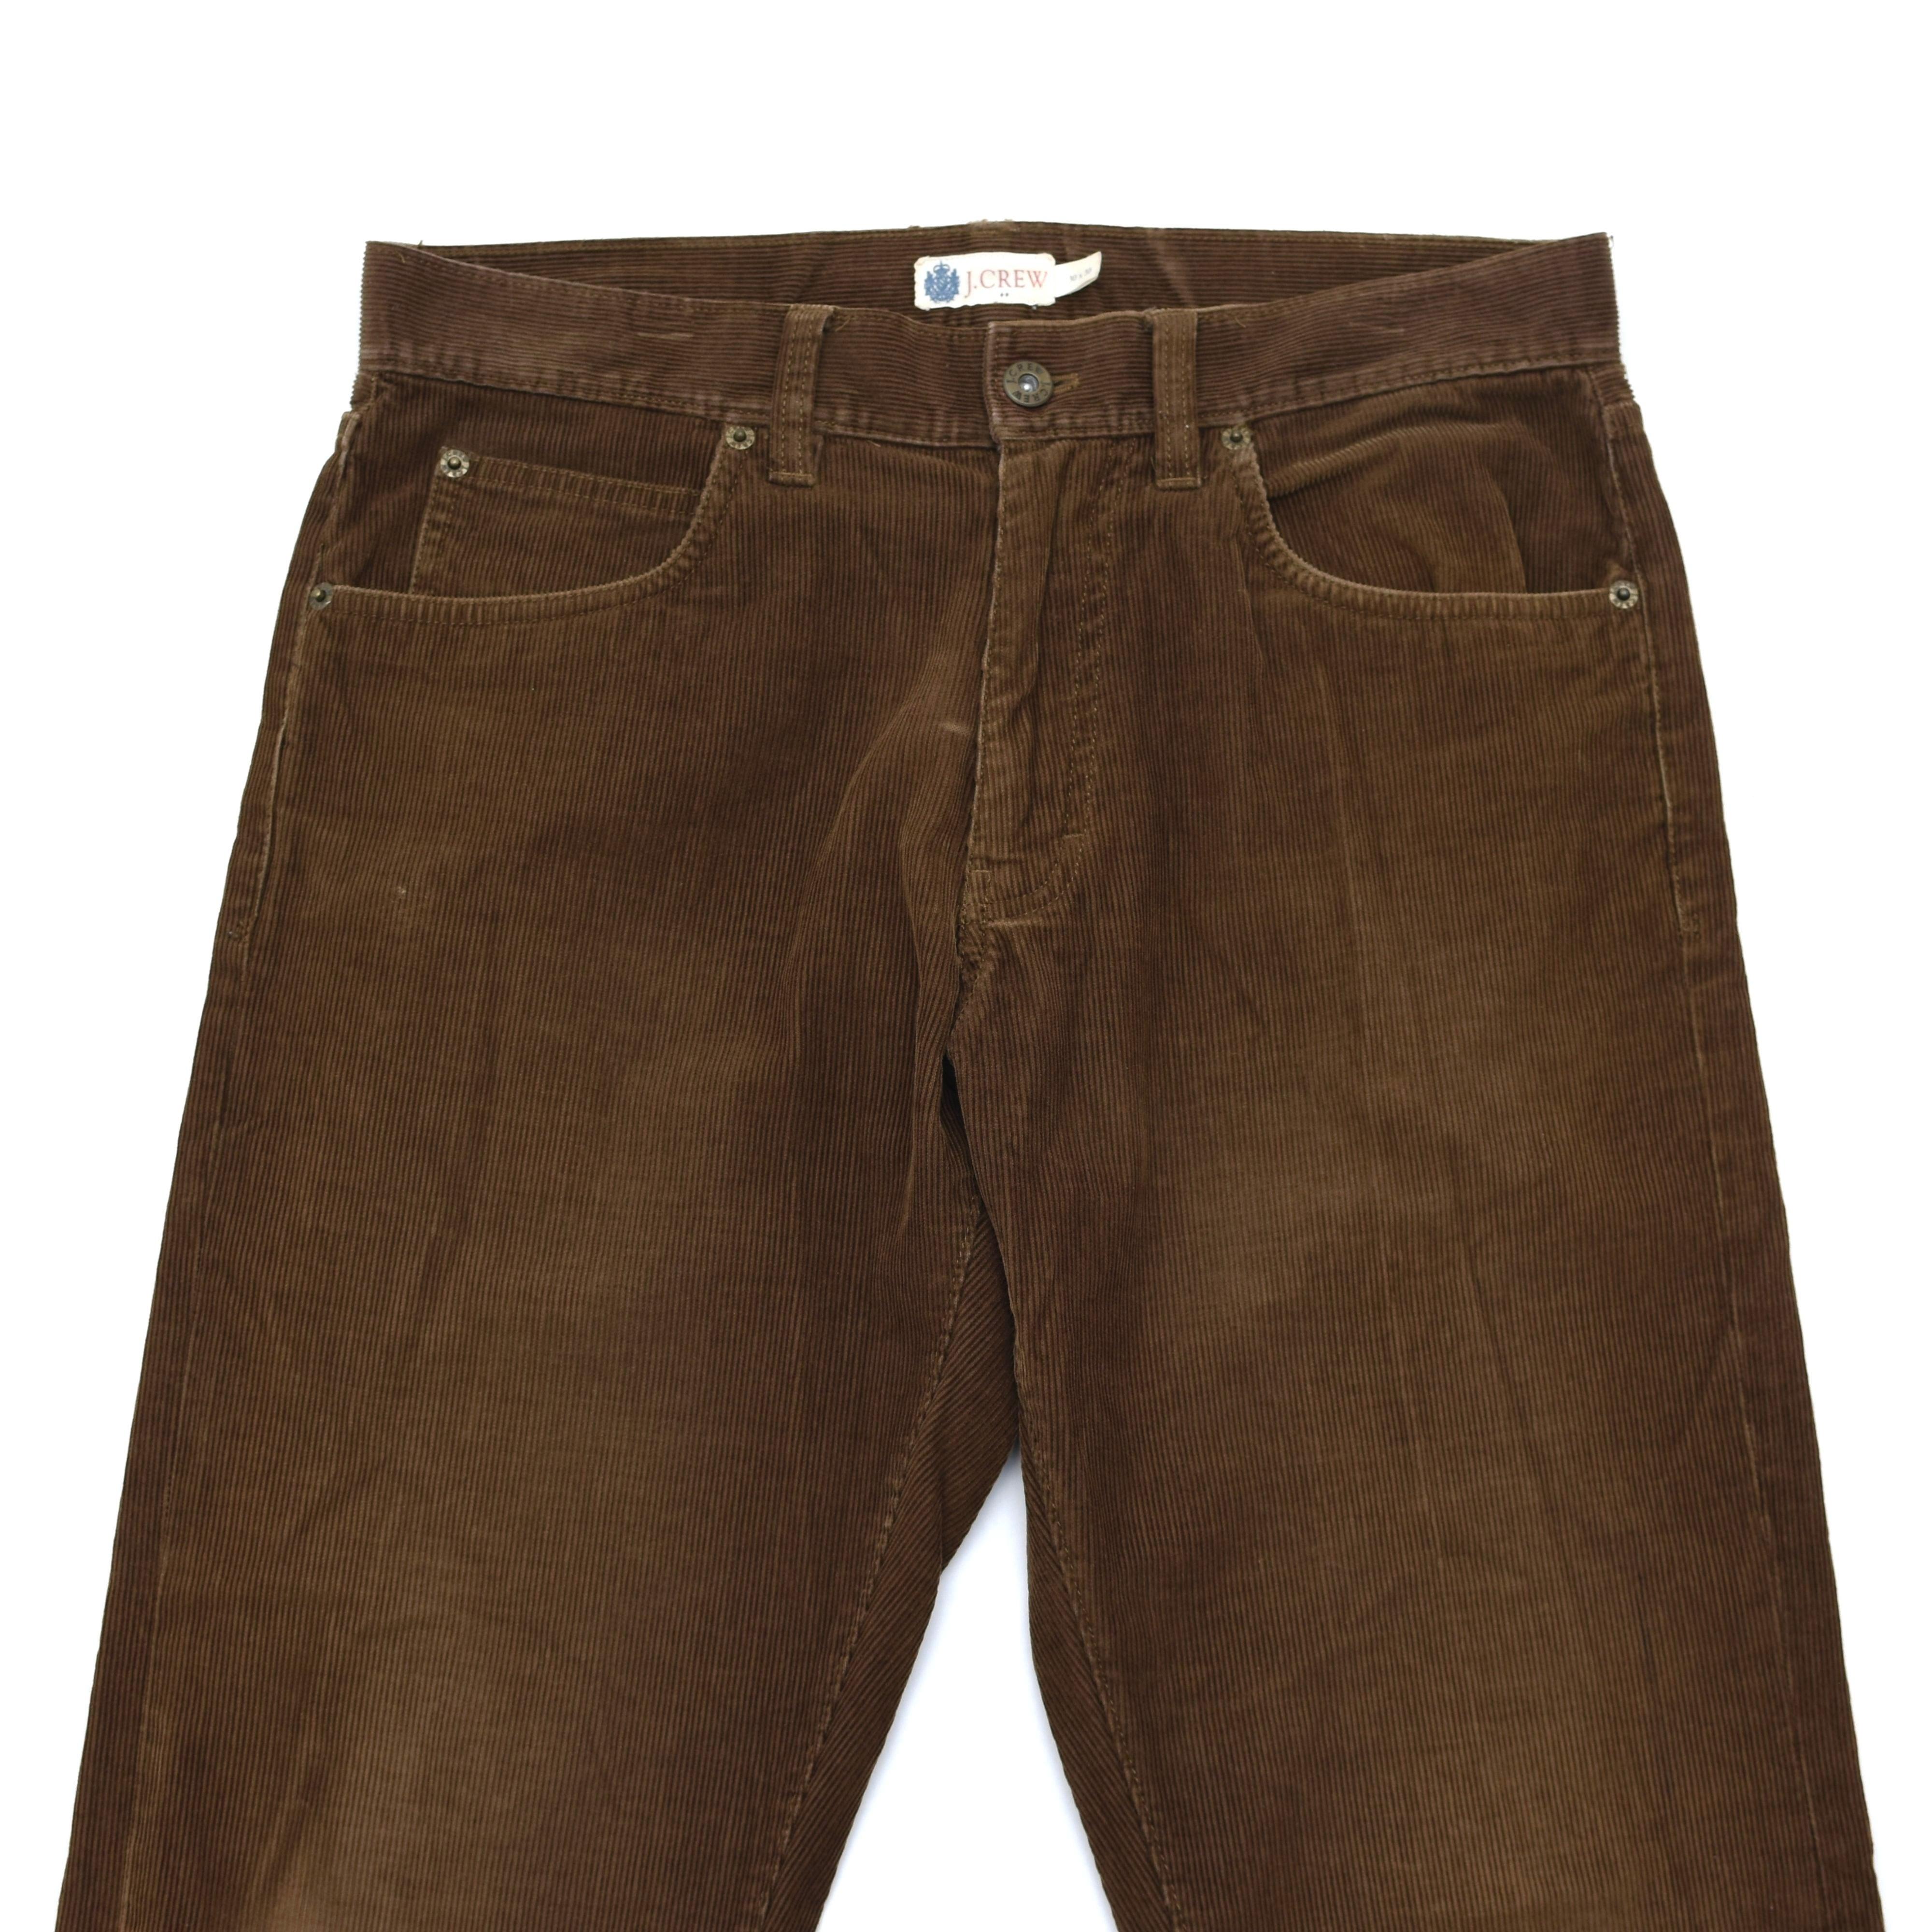 J.CREW brown corduroy pants